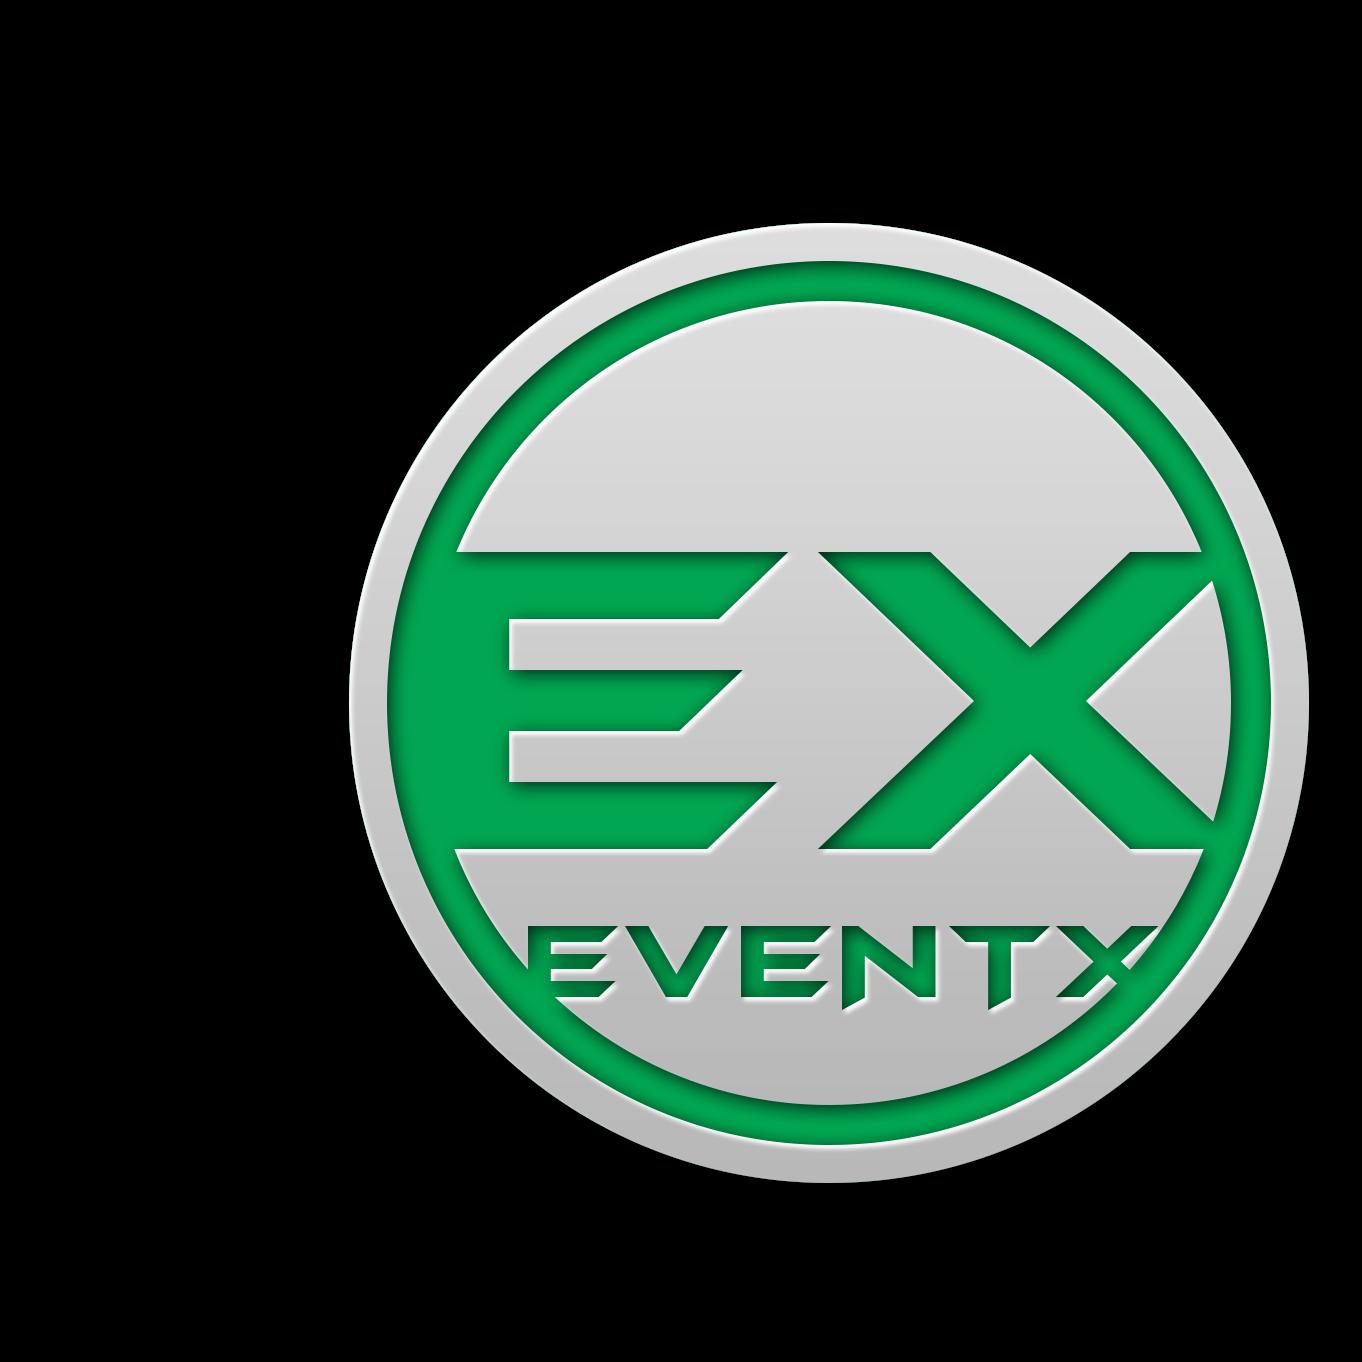 EventX - Your event partner